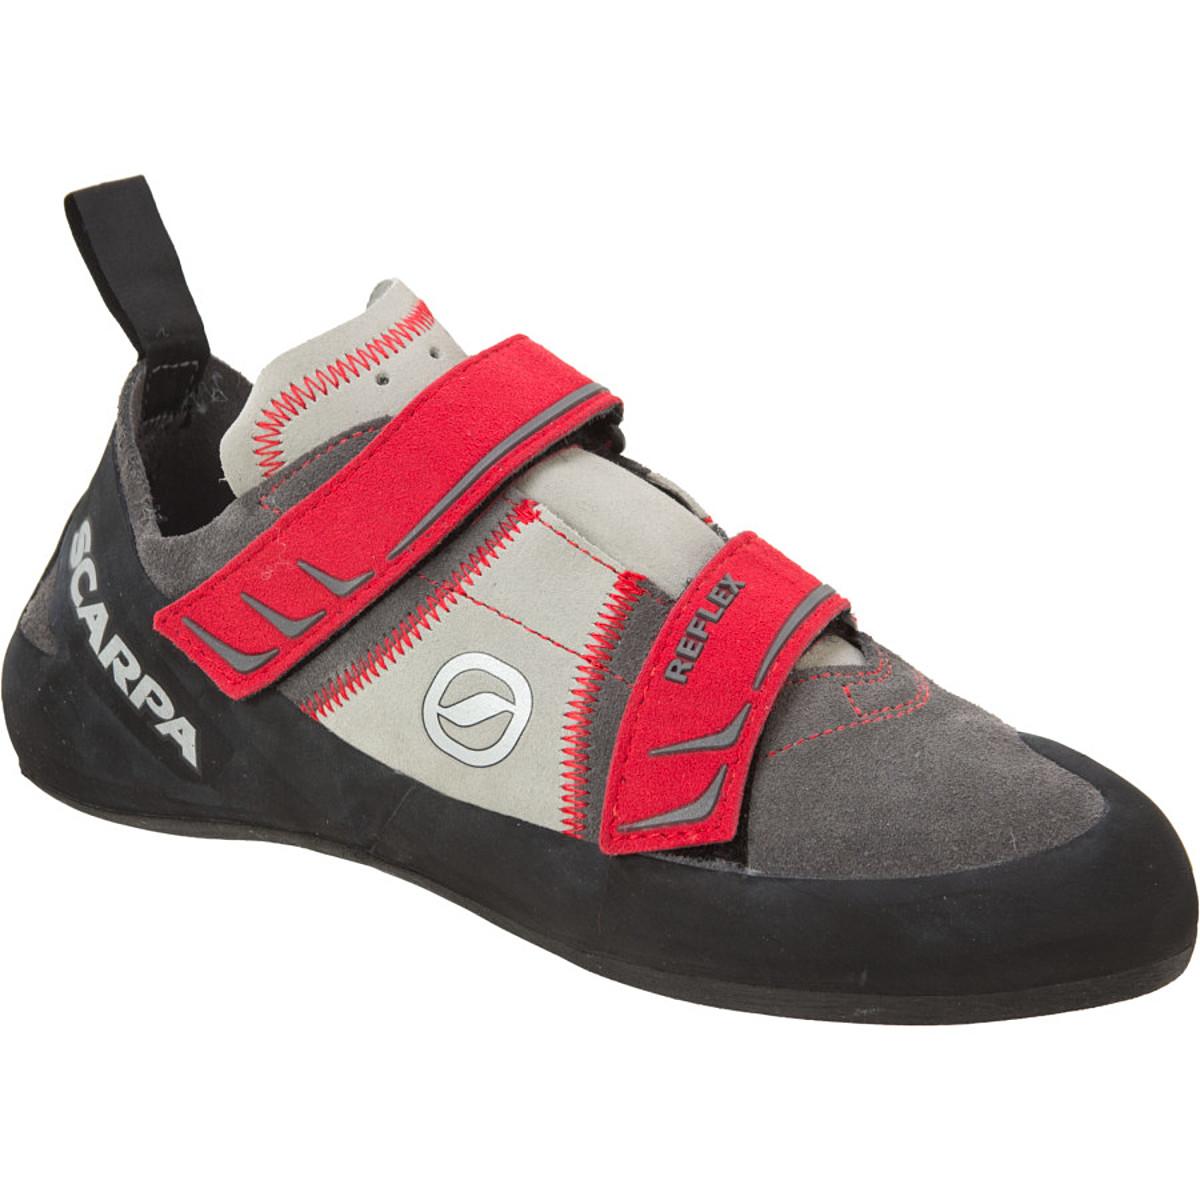 photo: Scarpa Reflex climbing shoe